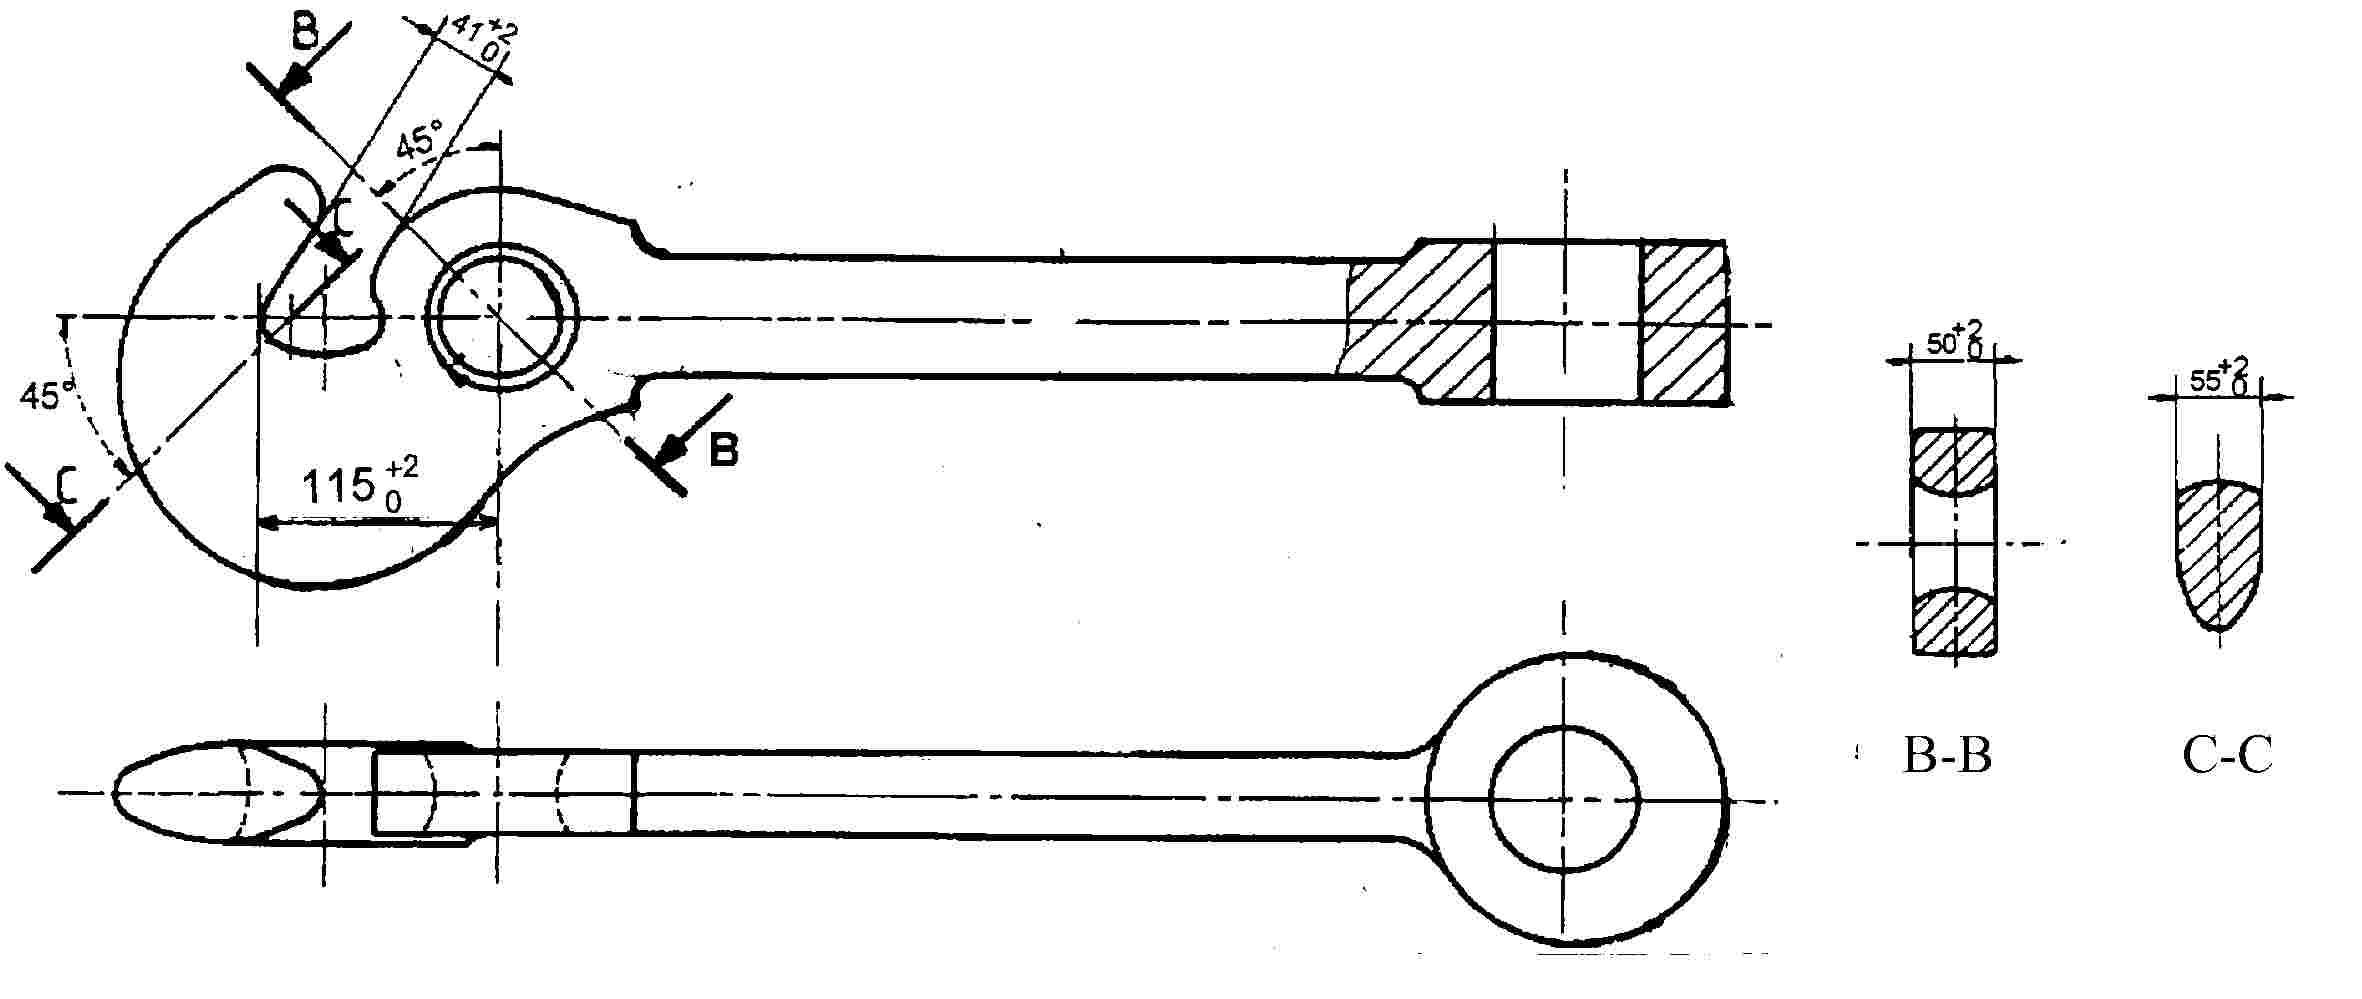 Eur Lex 02006d0861 20130124 En Conceptual Block Diagram Of Descal Calculator Image